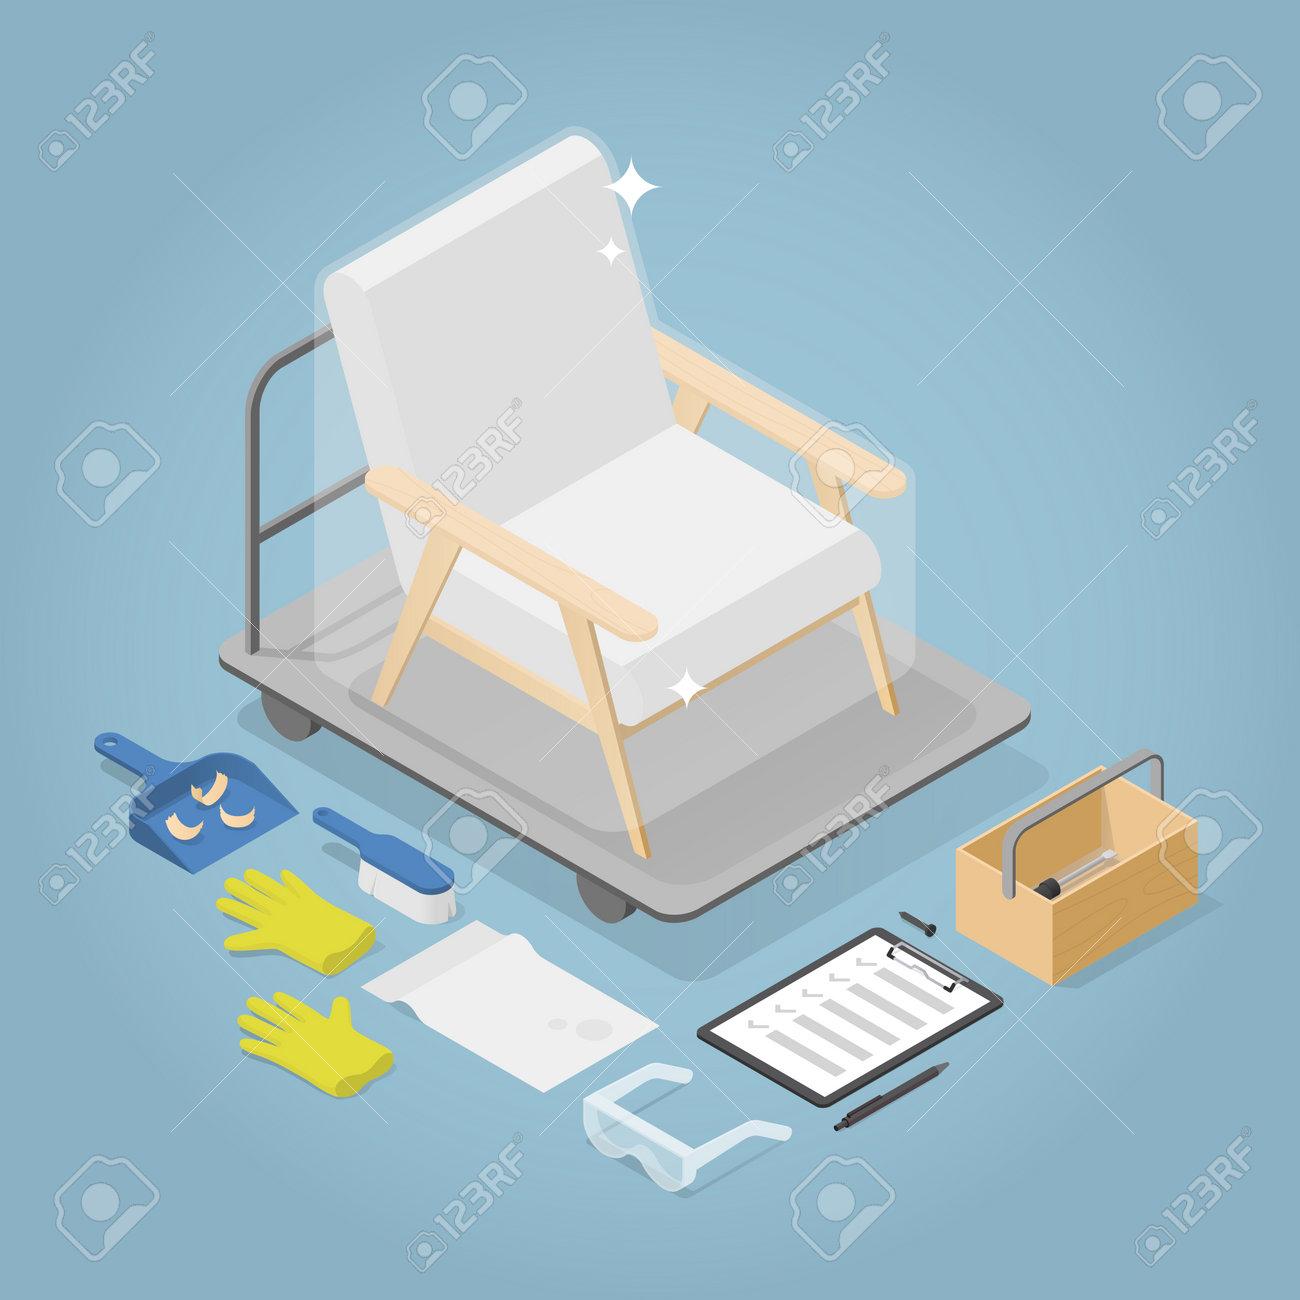 Isometric Armchair Restoration Illustration - 162524393